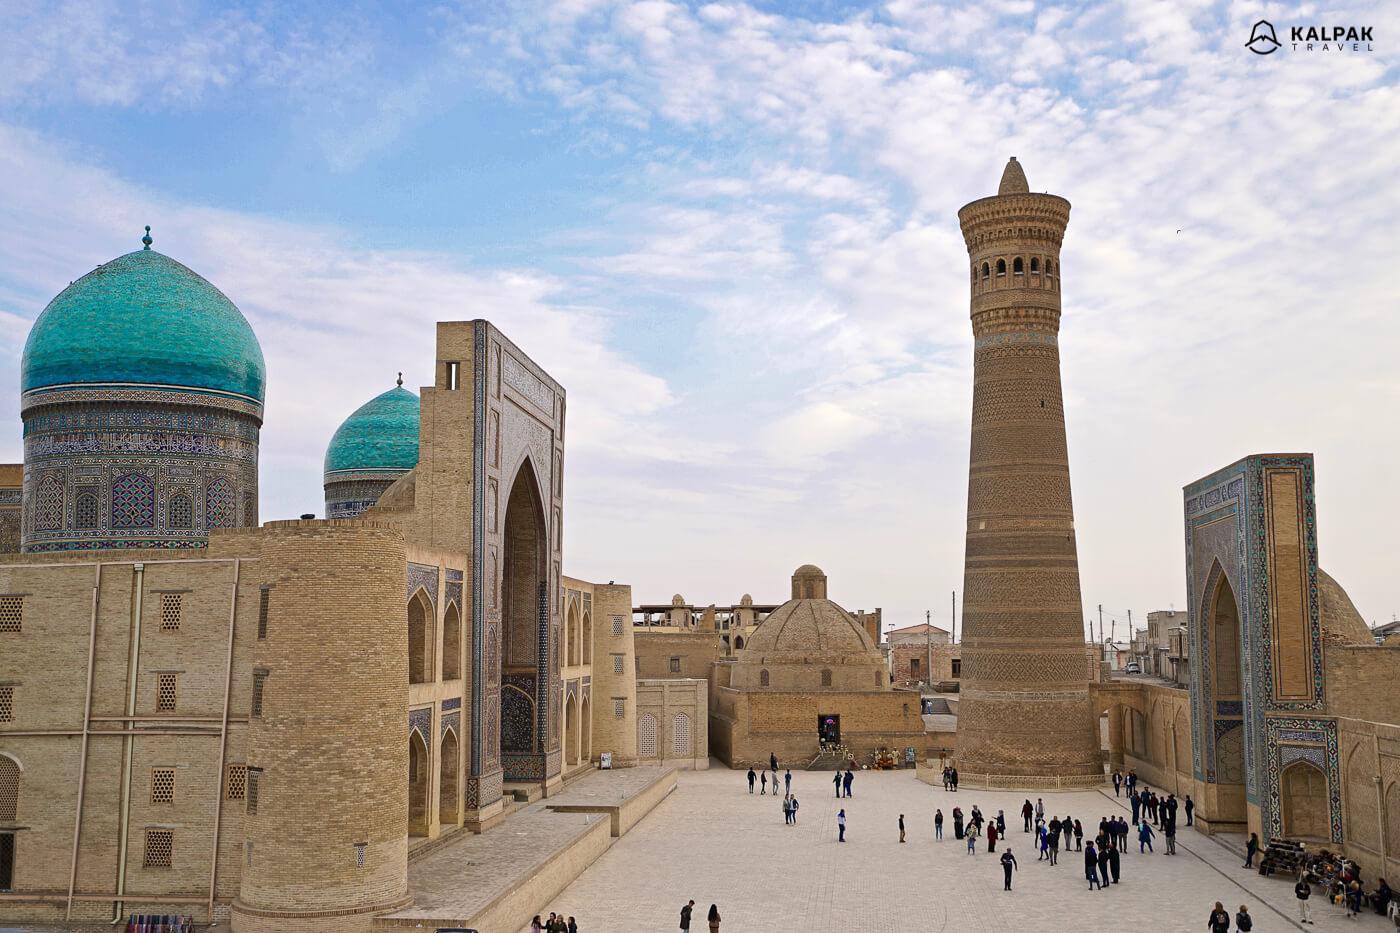 Buchara minaret in Usbekistan